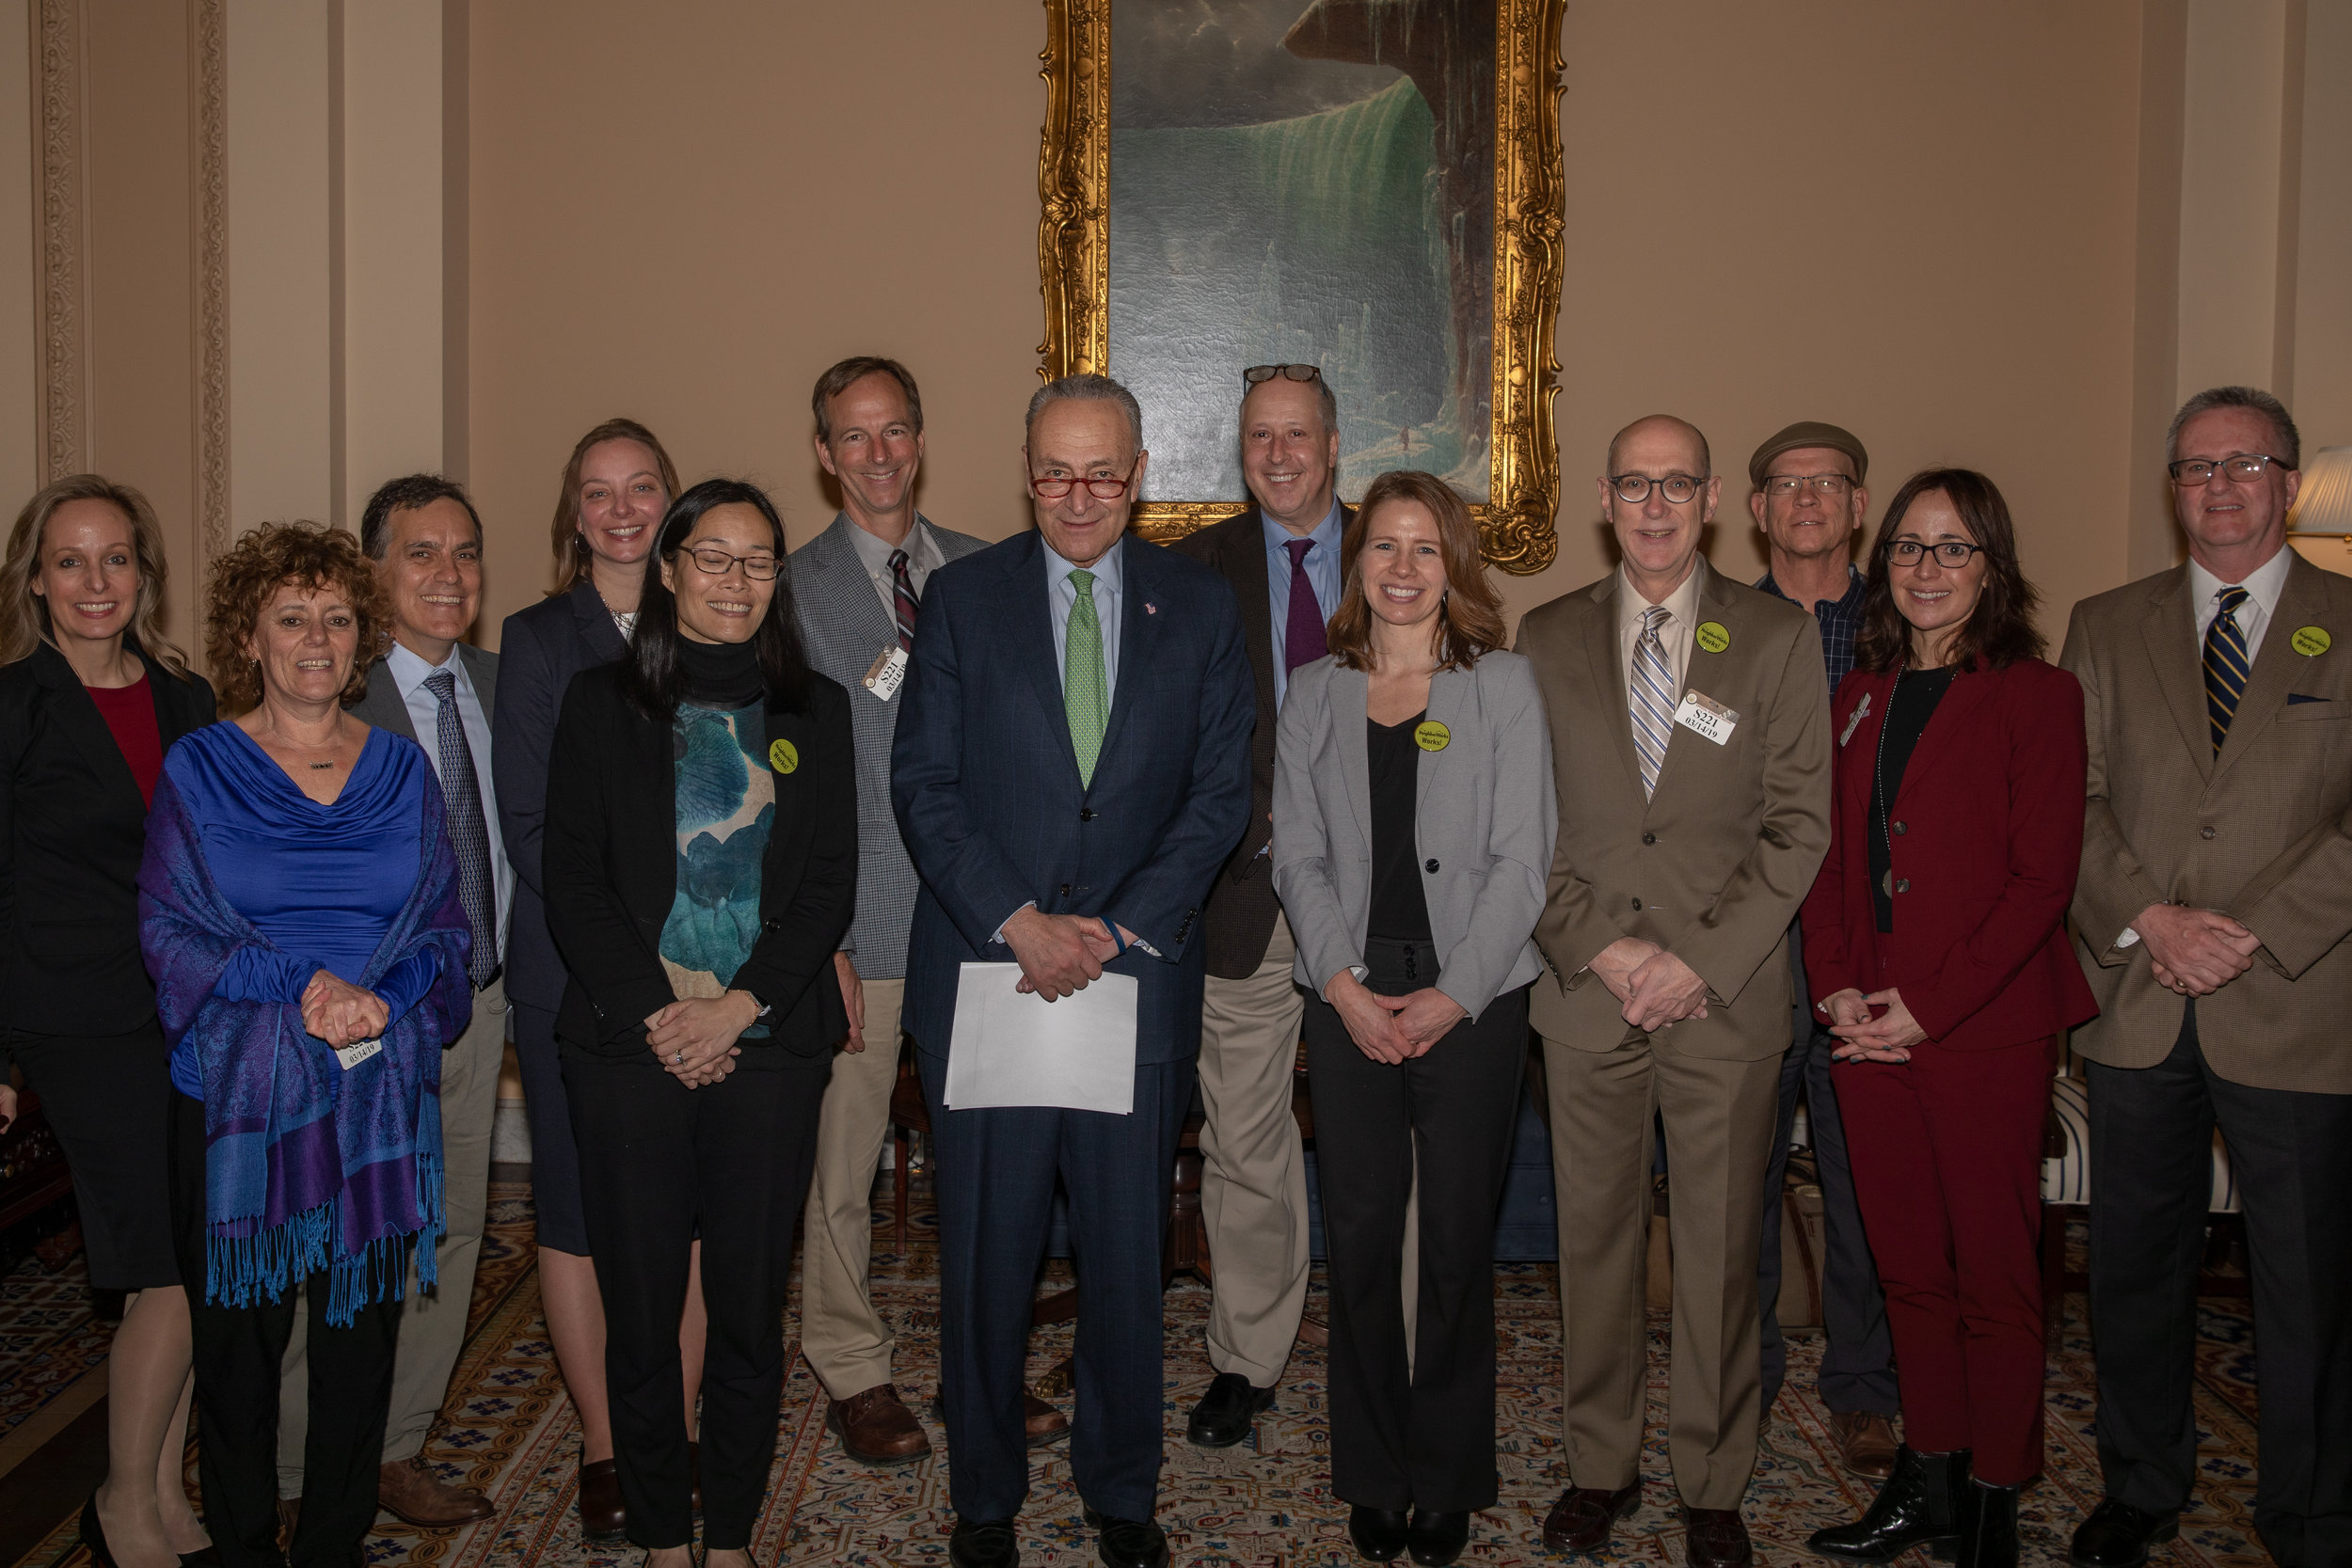 Senator Schumer - larger group darker 3-14-19.jpg